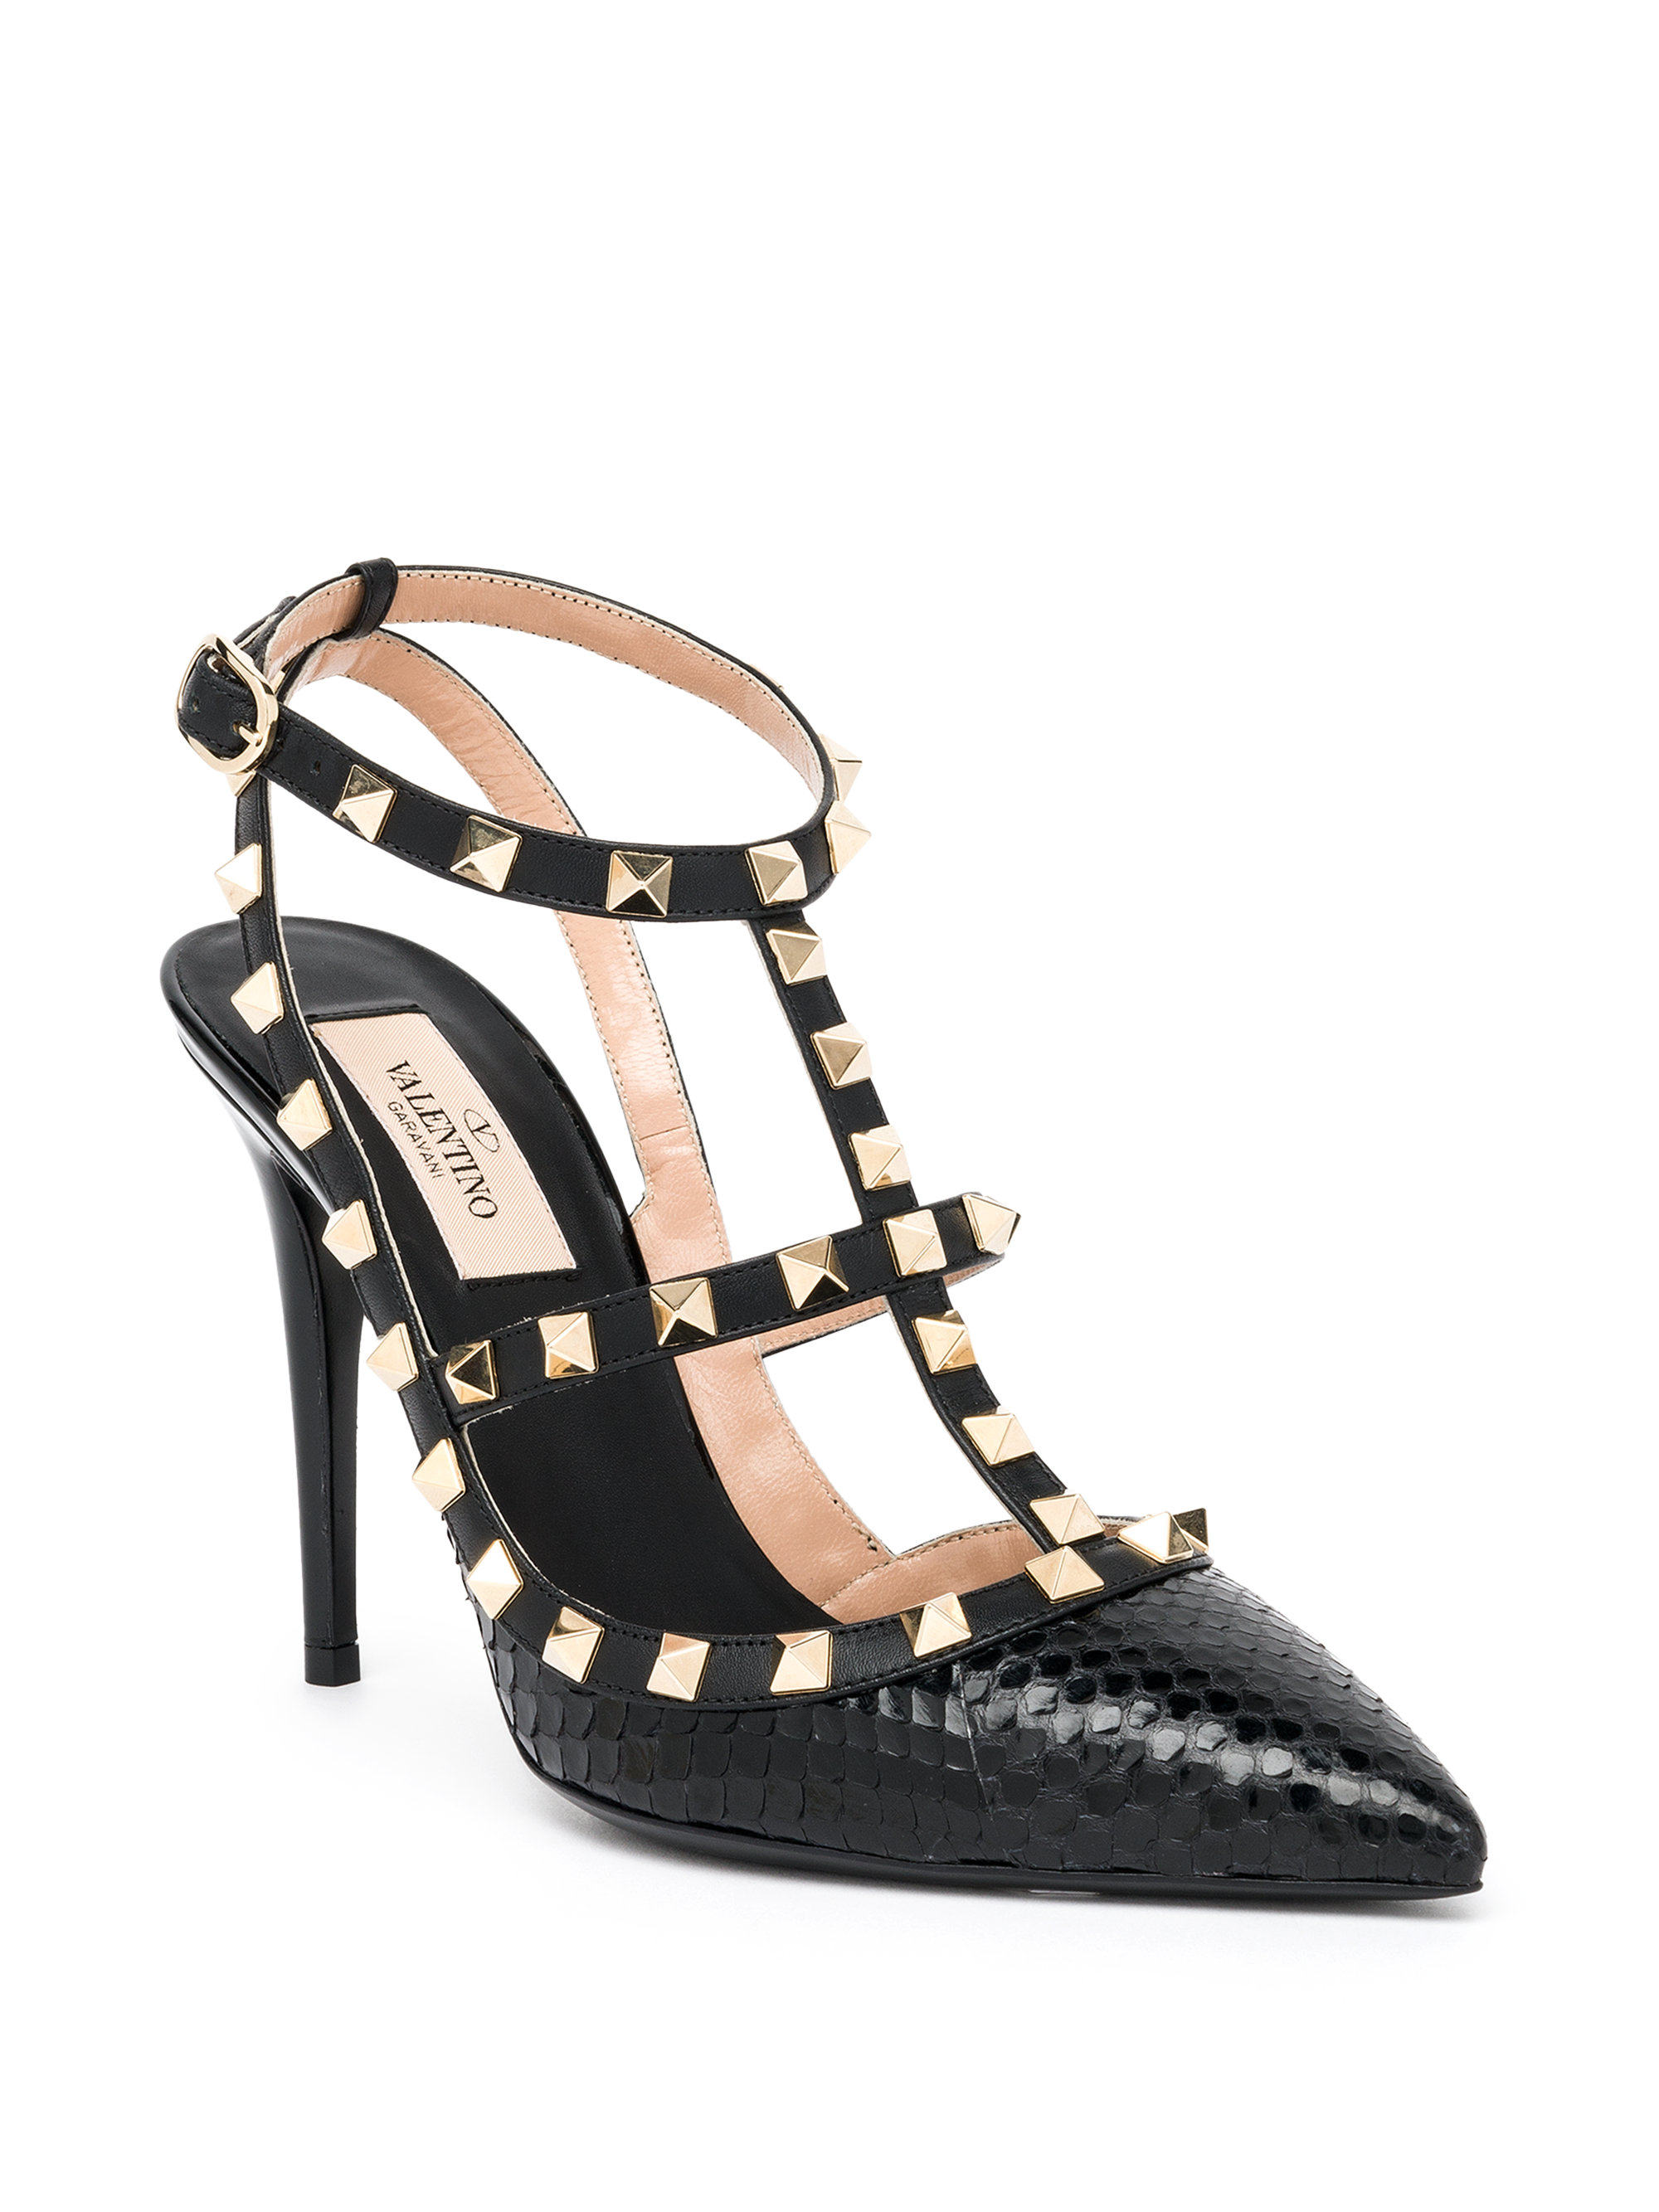 Lyst Valentino Rockstud Studded Snakeskin Amp Leather